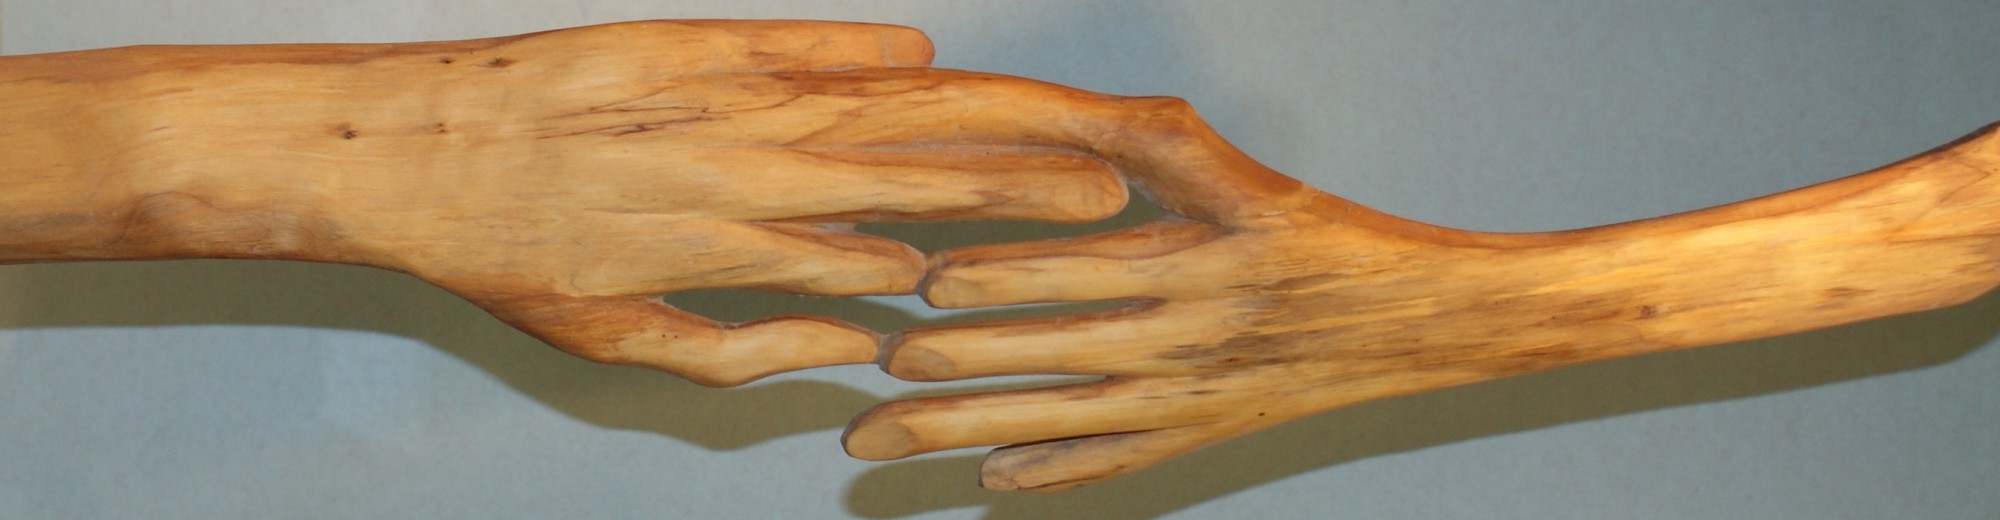 Wout Koppers, beeldhouwer